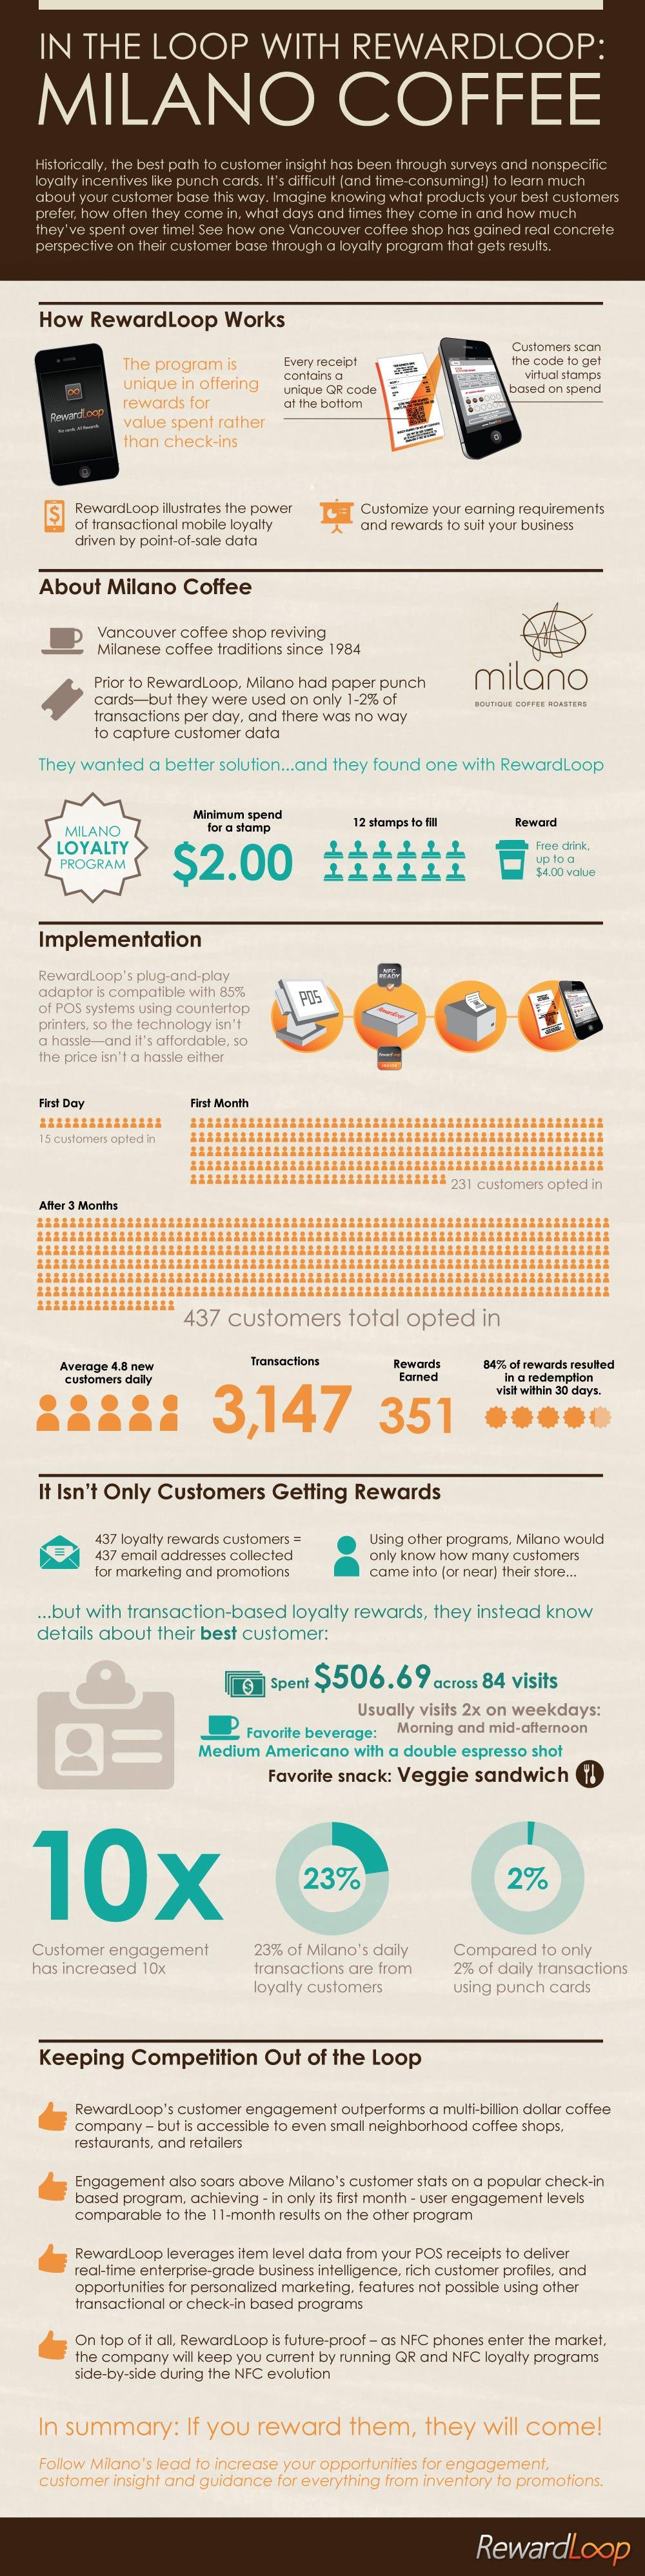 RewardLoop-Milano-Coffee-Infographic